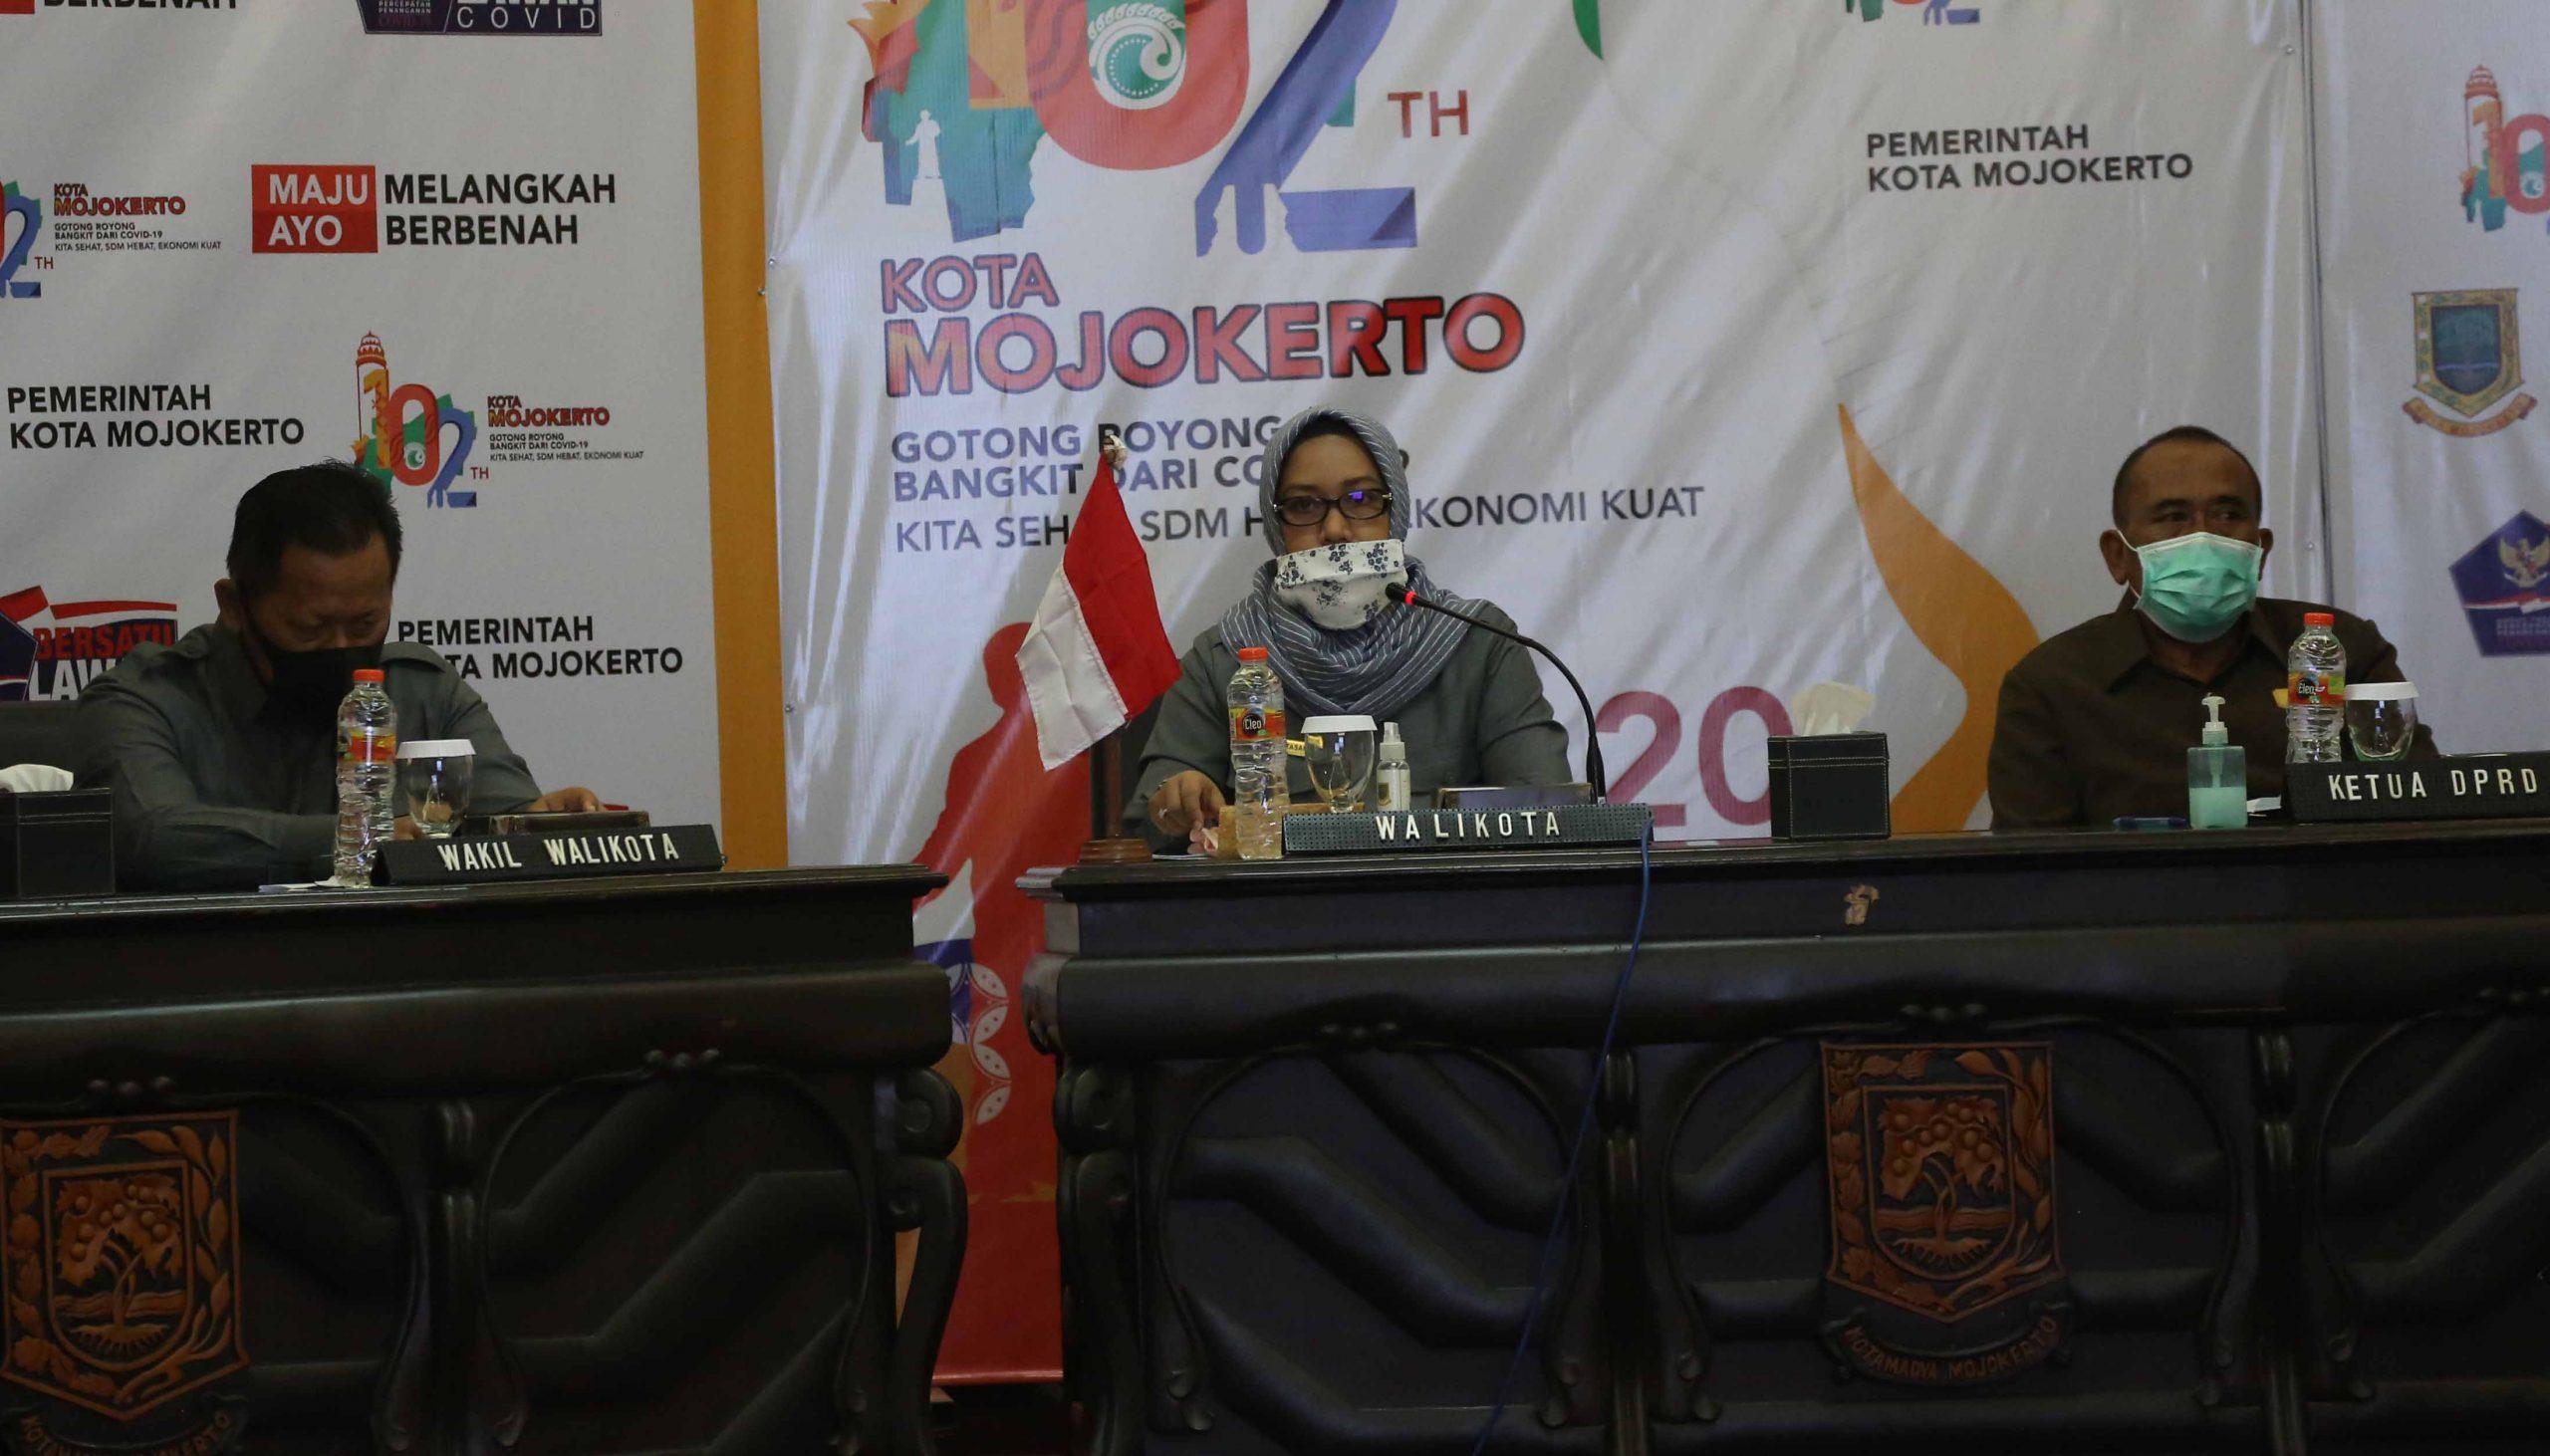 foto : Sosialisasi perwali mojokerto 55